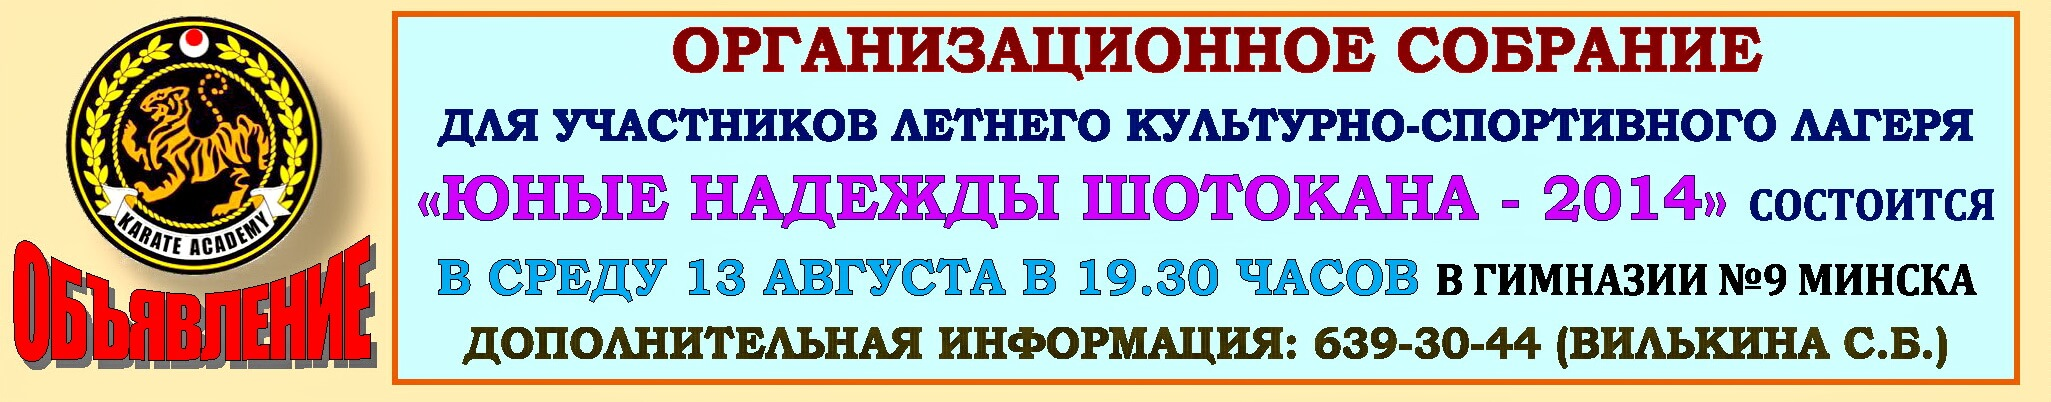 АК Собрание 2014-08-13